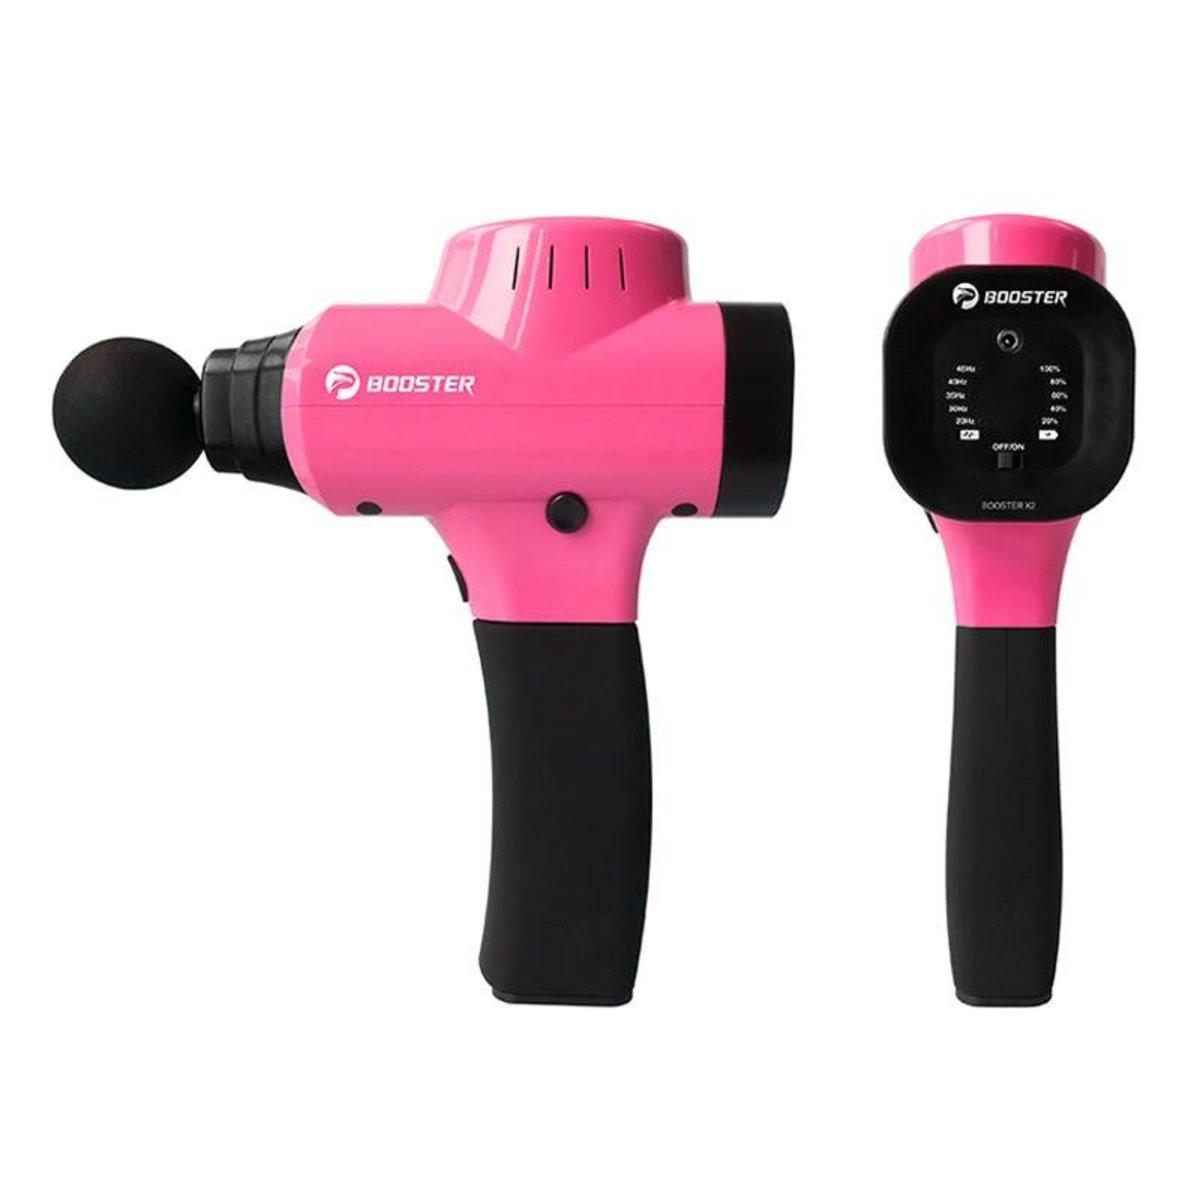 X2 深層肌肉治療按摩槍 - 粉紅色